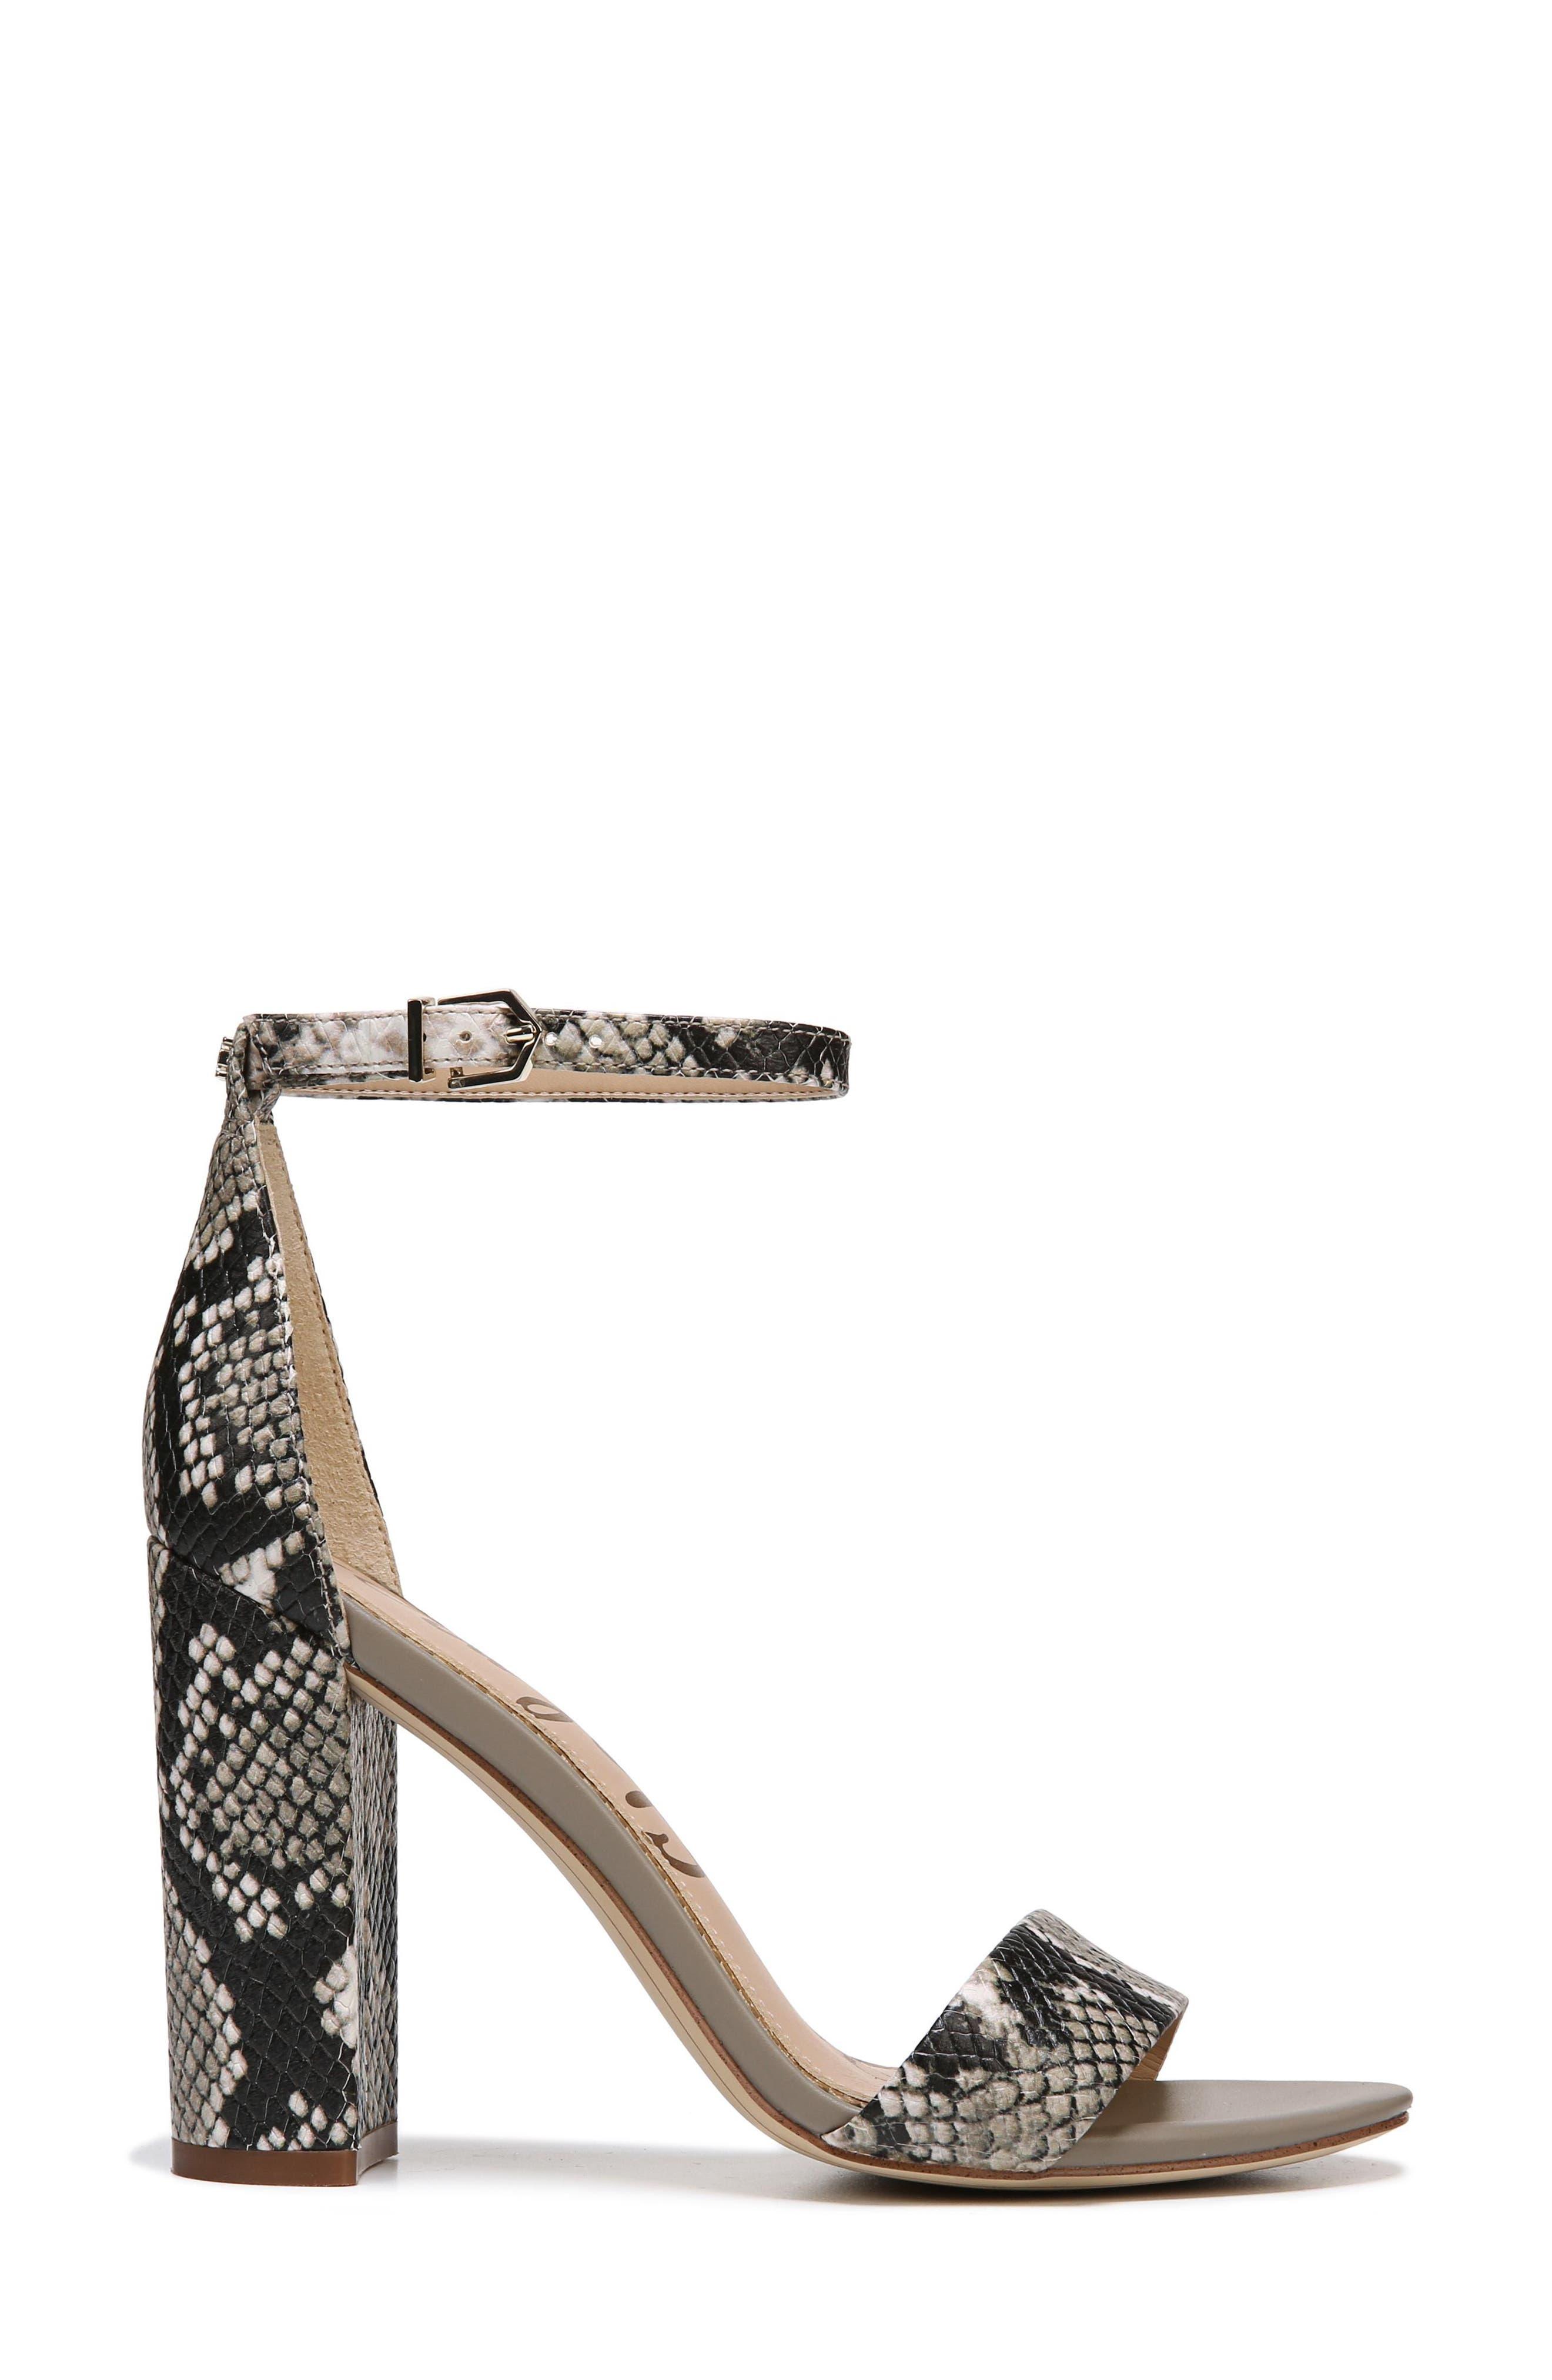 Yaro Ankle Strap Sandal,                             Alternate thumbnail 5, color,                             Natural Snake Print Leather